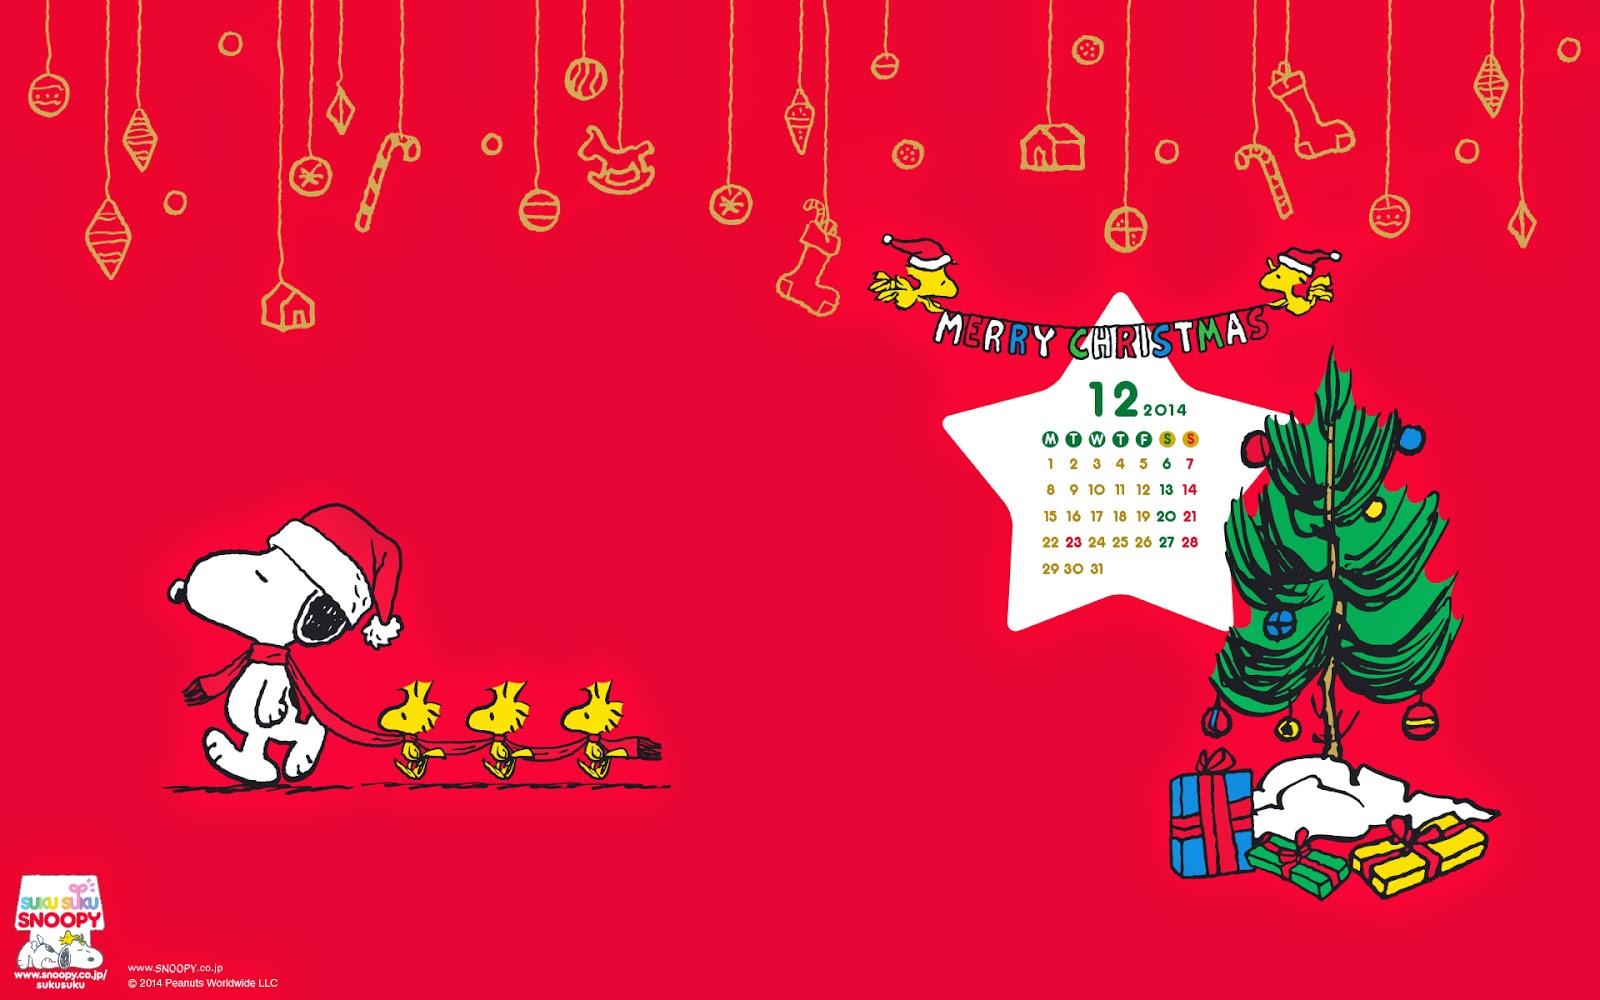 kawaii christmas wallpaper,cartoon,fictional character,illustration